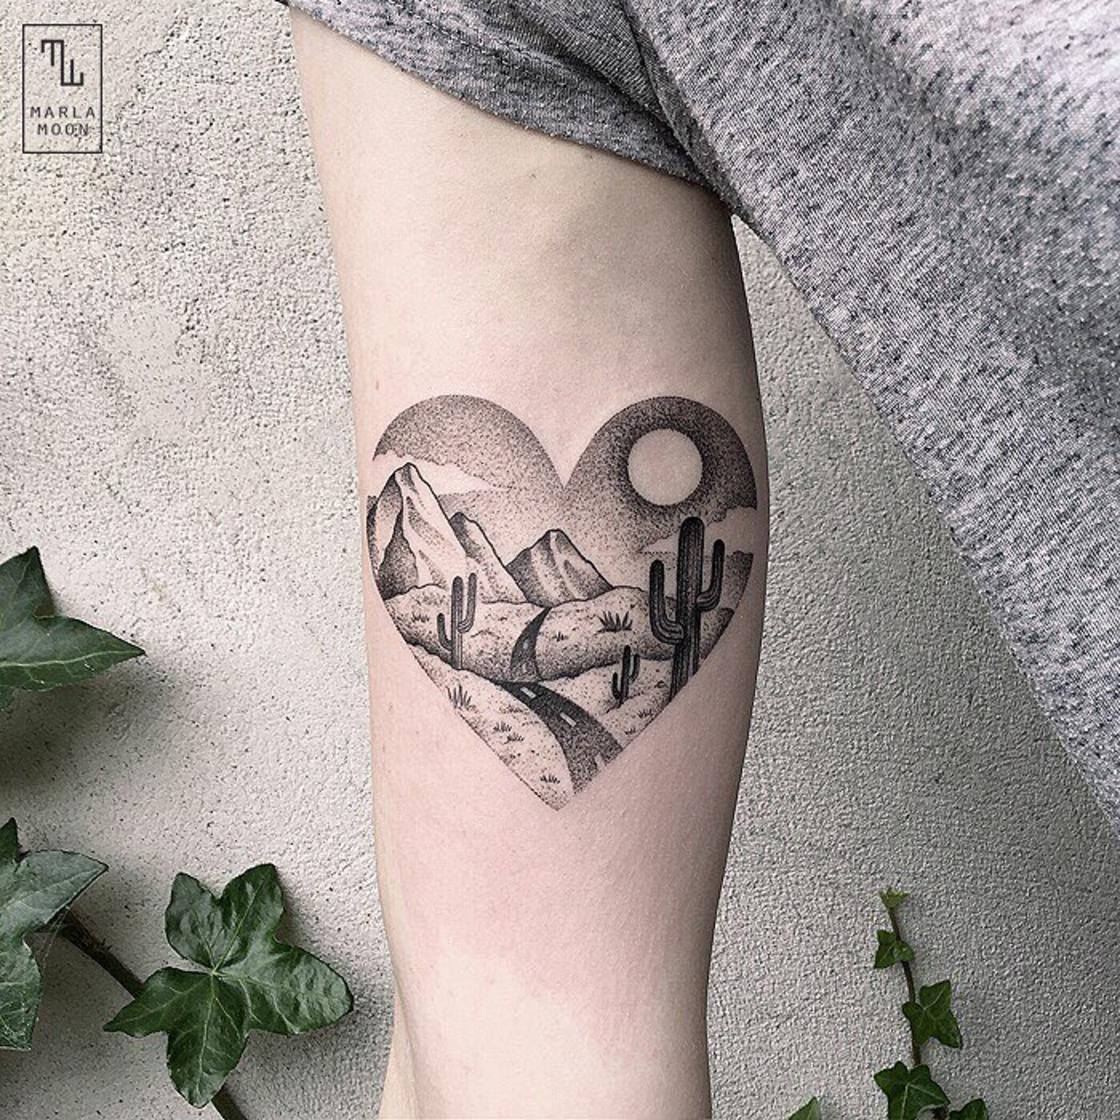 The beautiful tattoos of Marla Moon